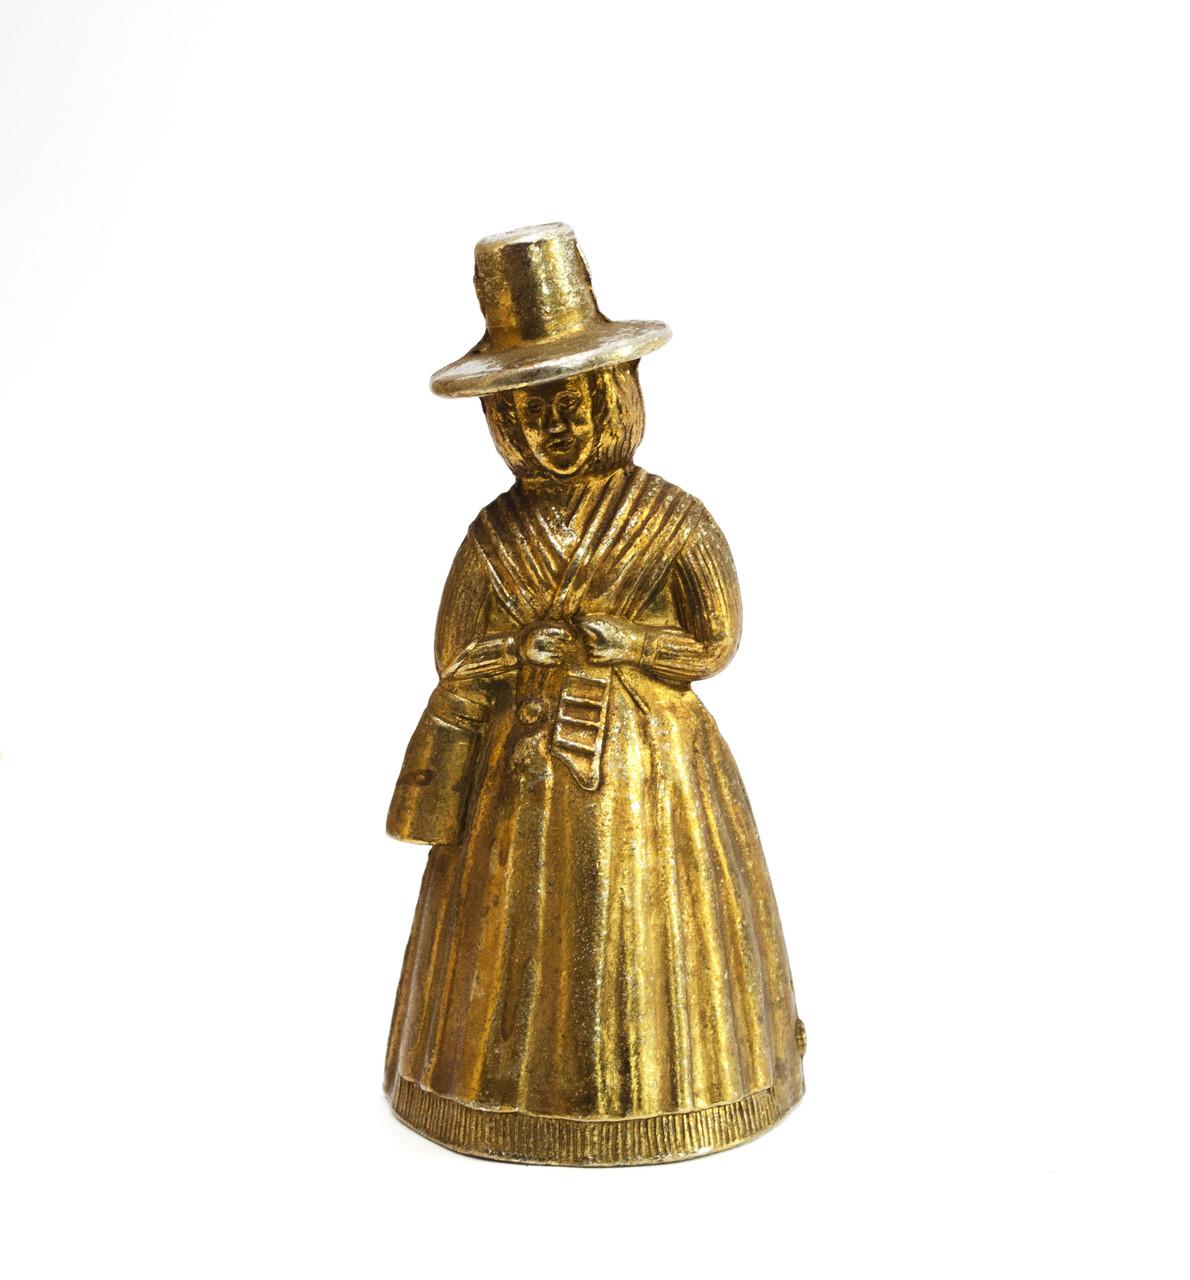 Коллекционный колокольчик, латунь?, Англия